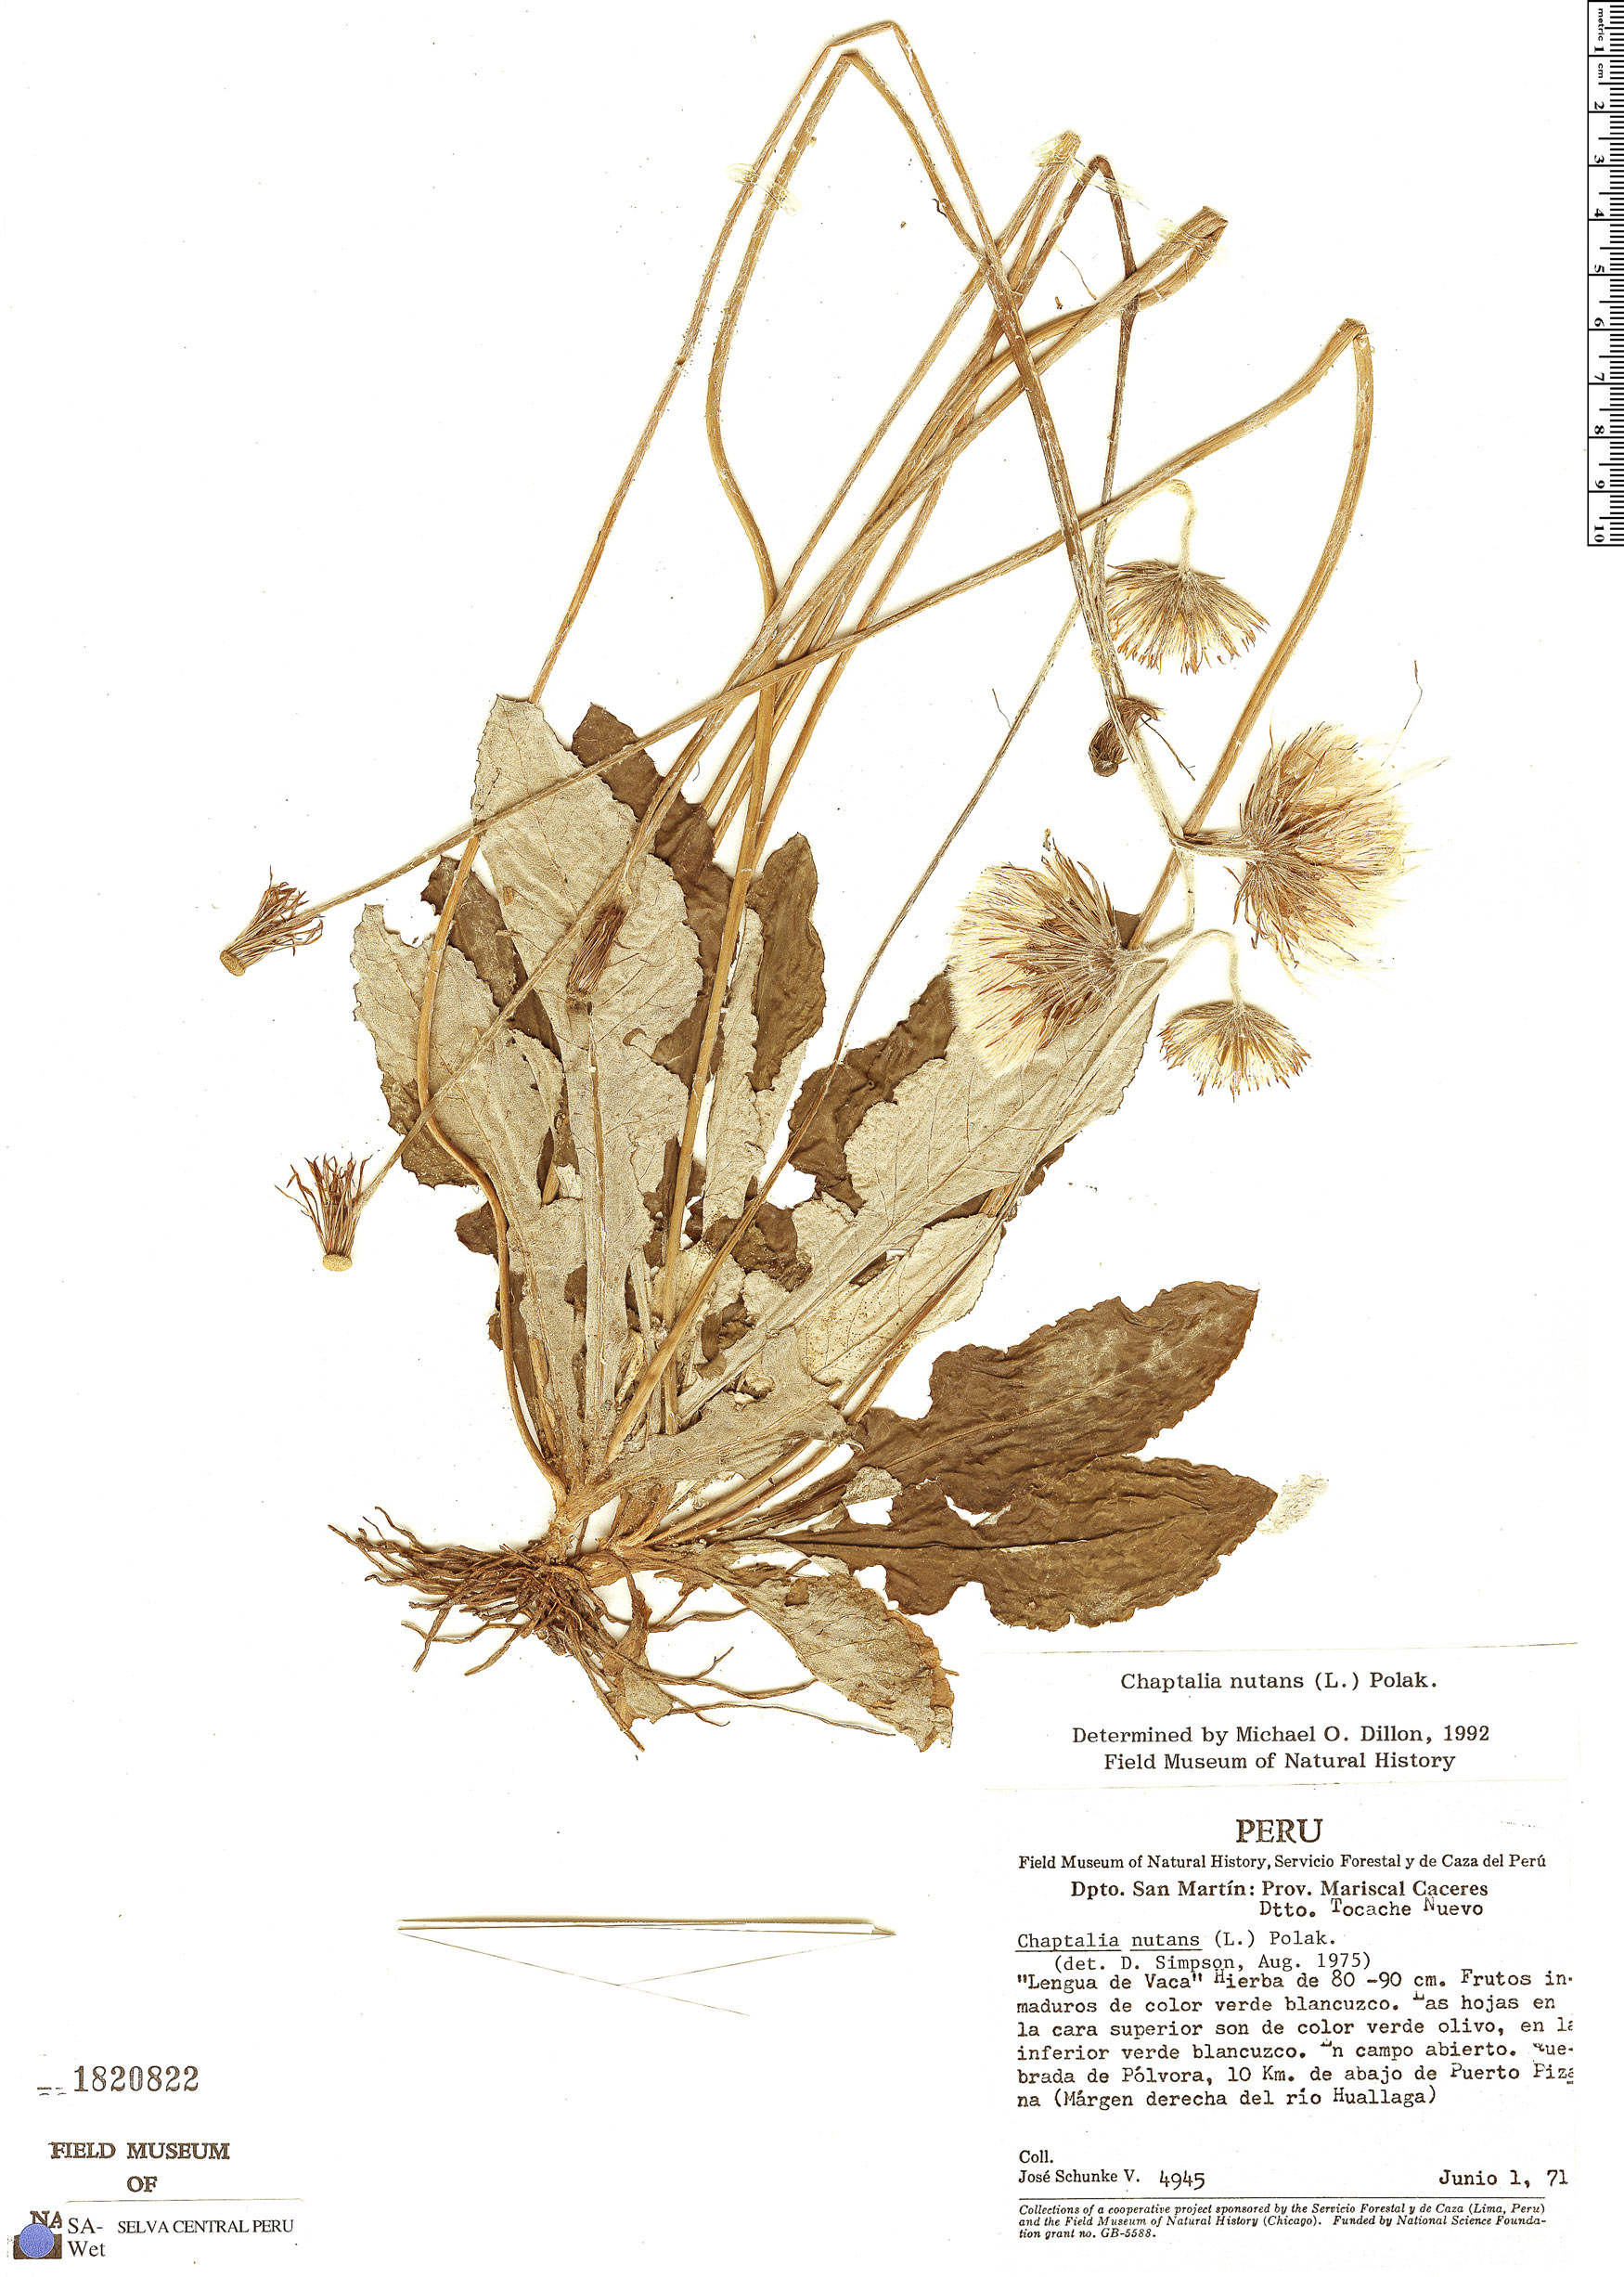 Specimen: Chaptalia nutans